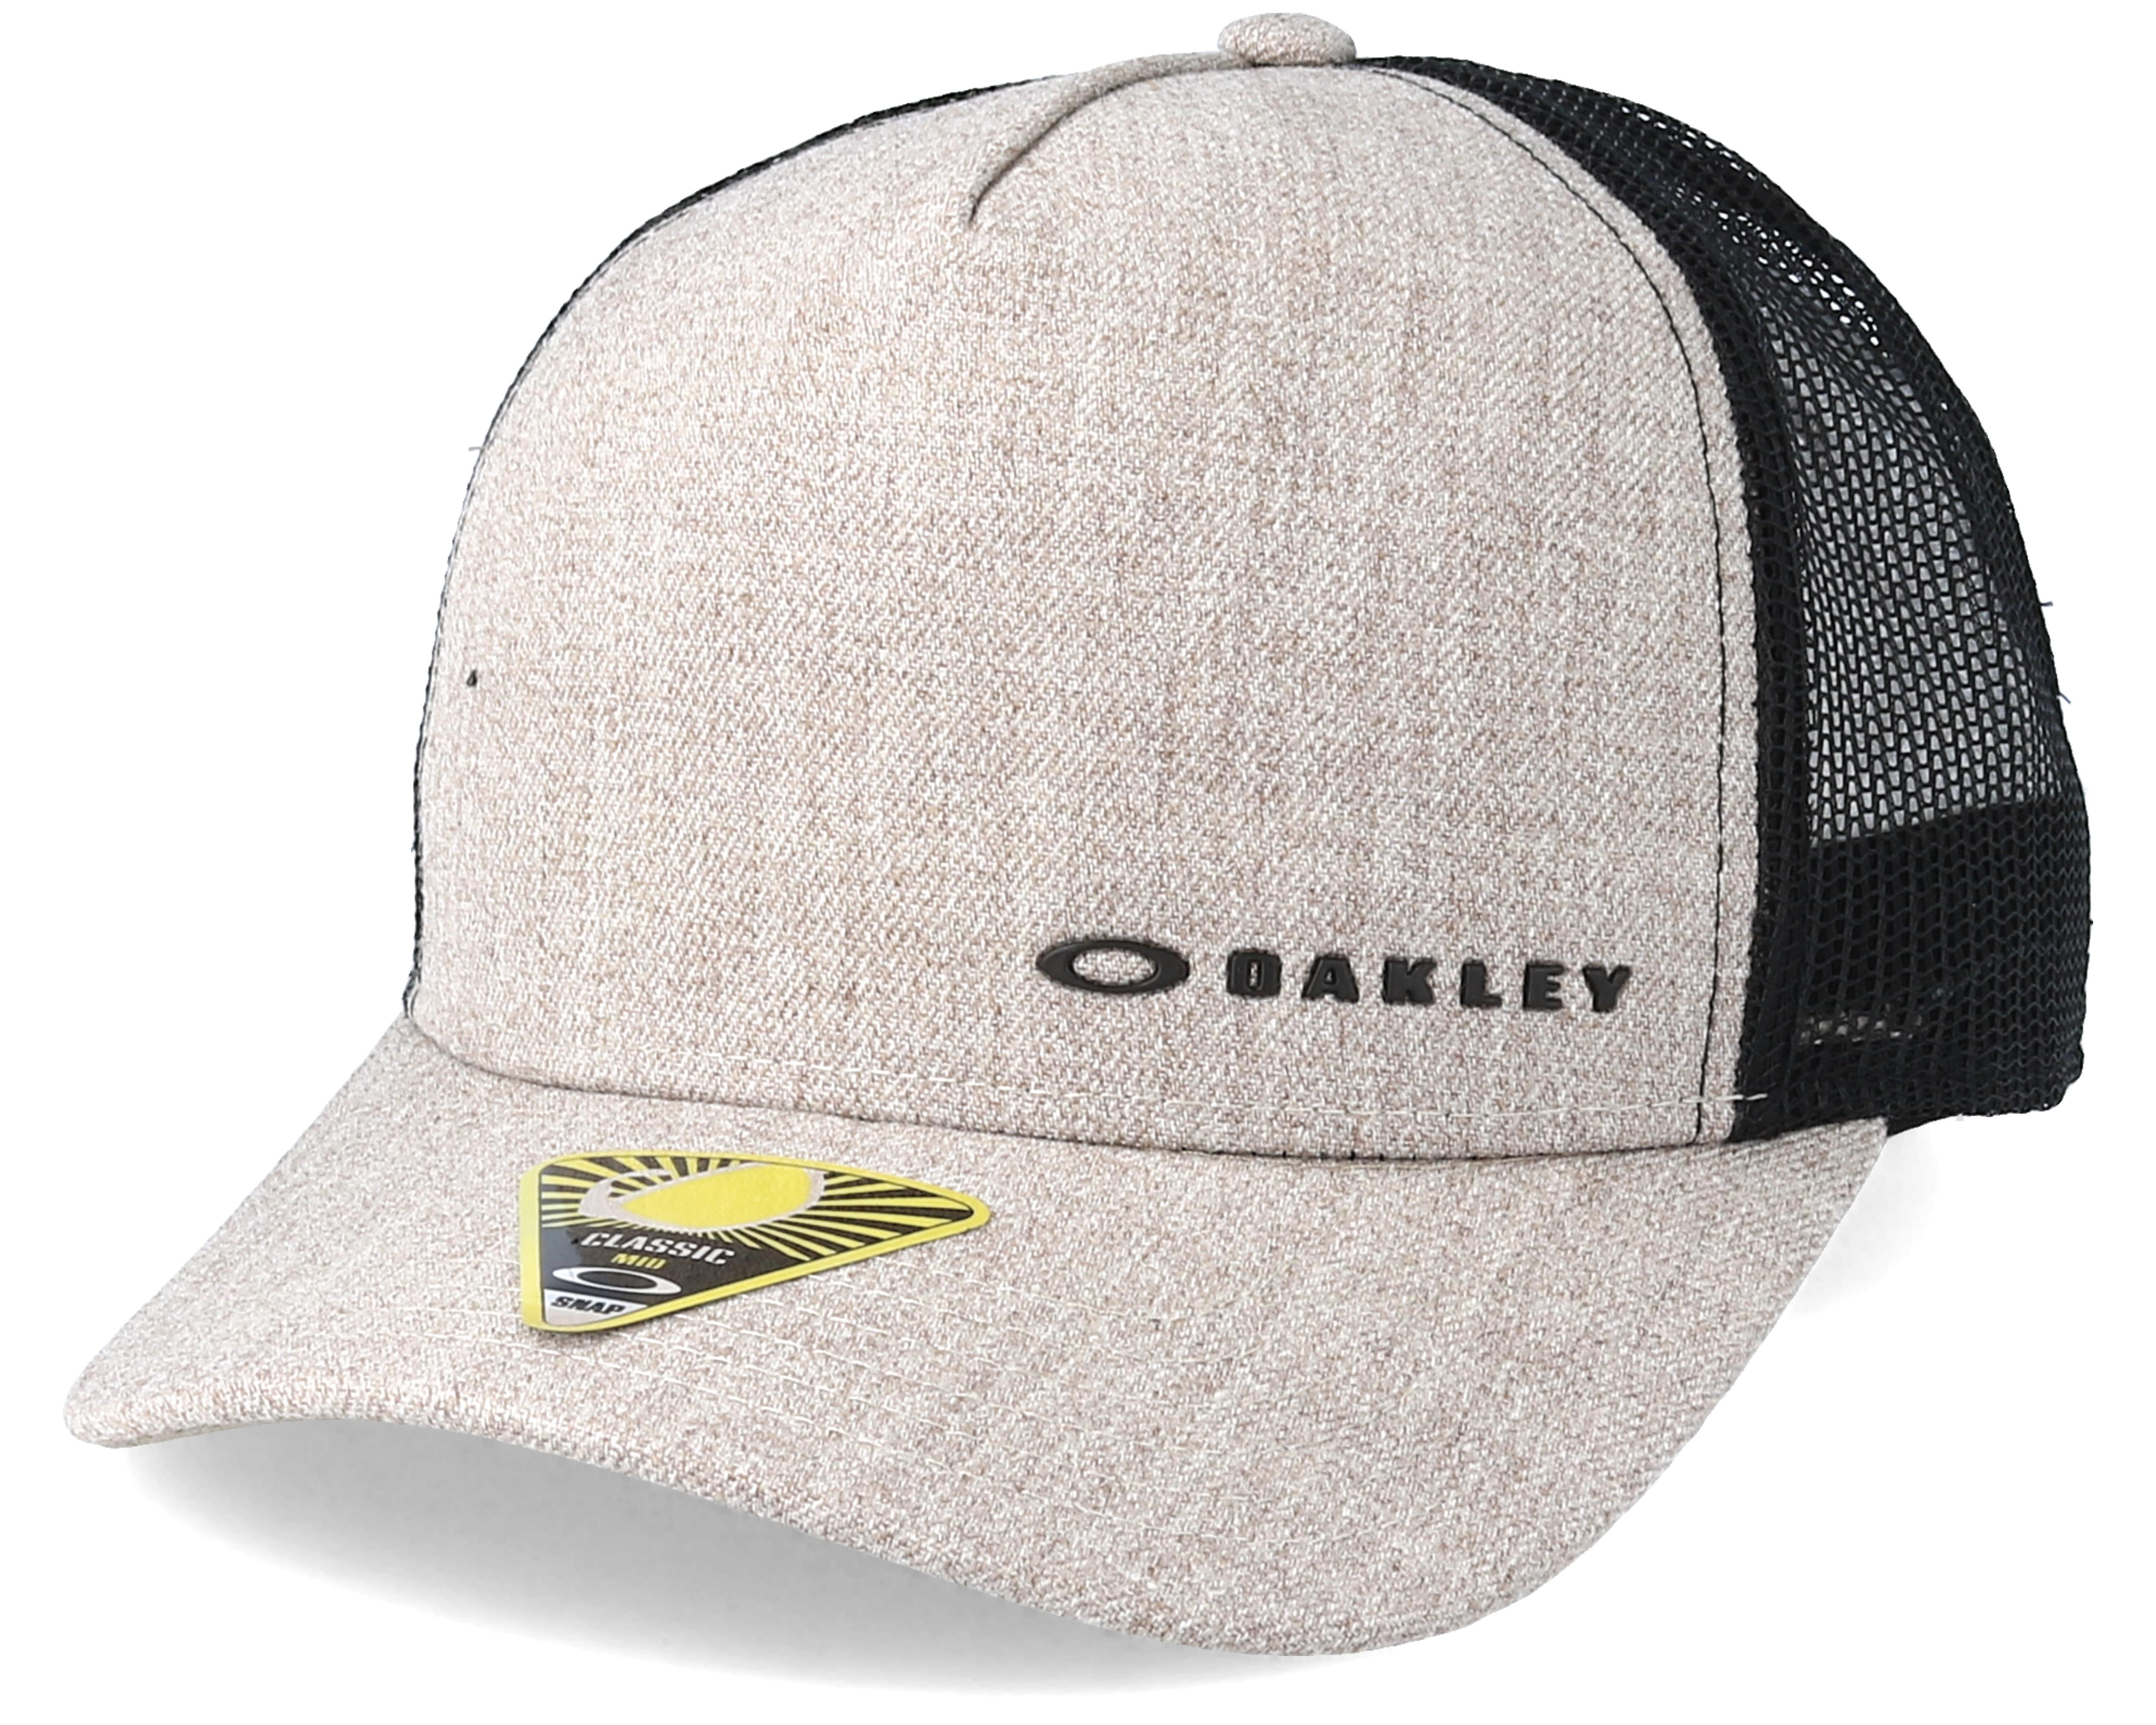 newest 15ebb a60ee ... discount code for chalten grey rye trucker oakley caps hatstore 2a950  c16ae